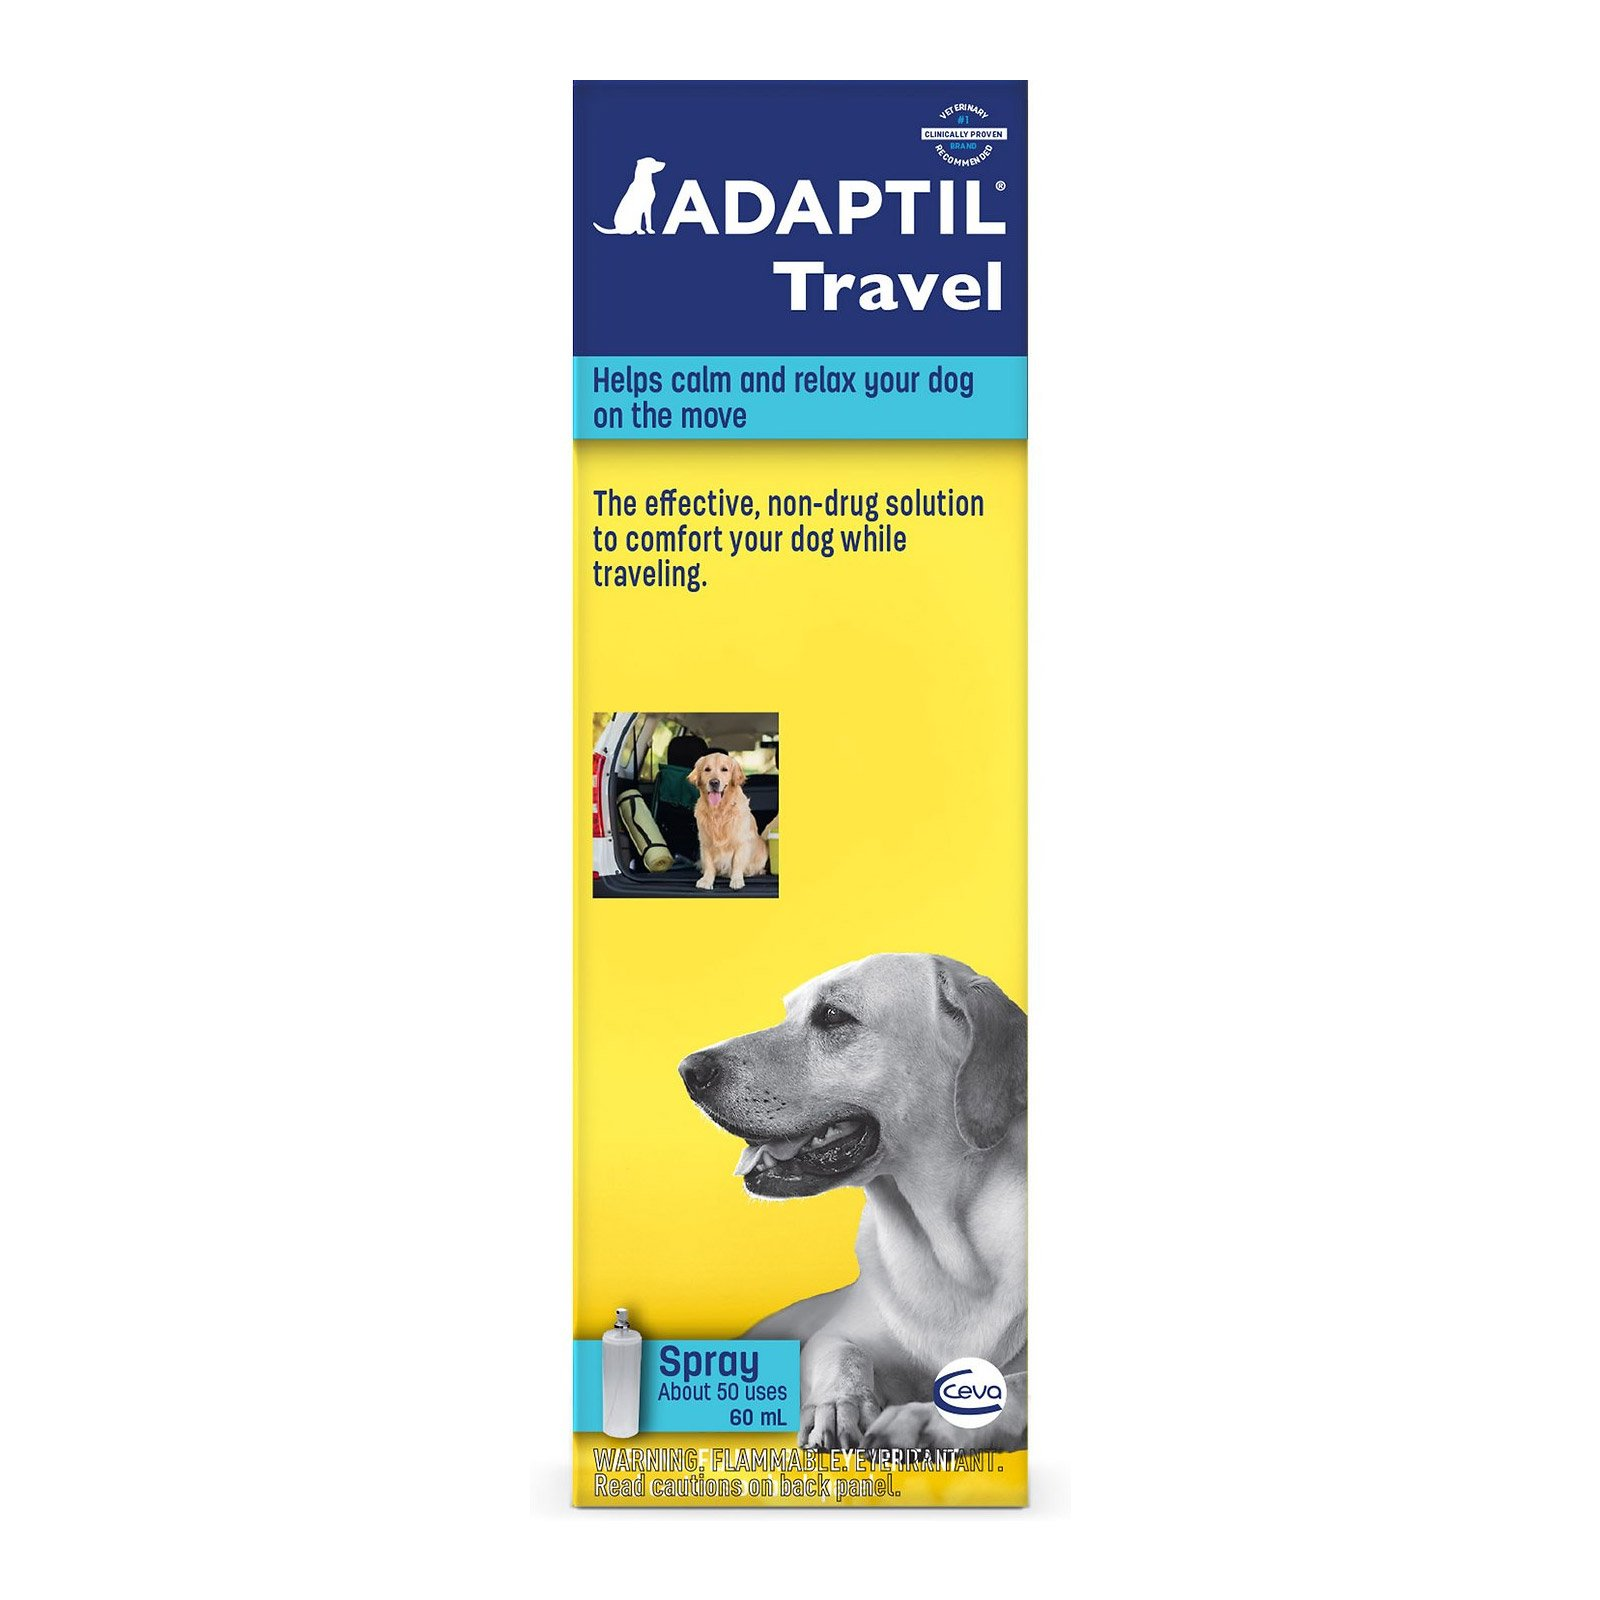 DAP Spray for Dogs